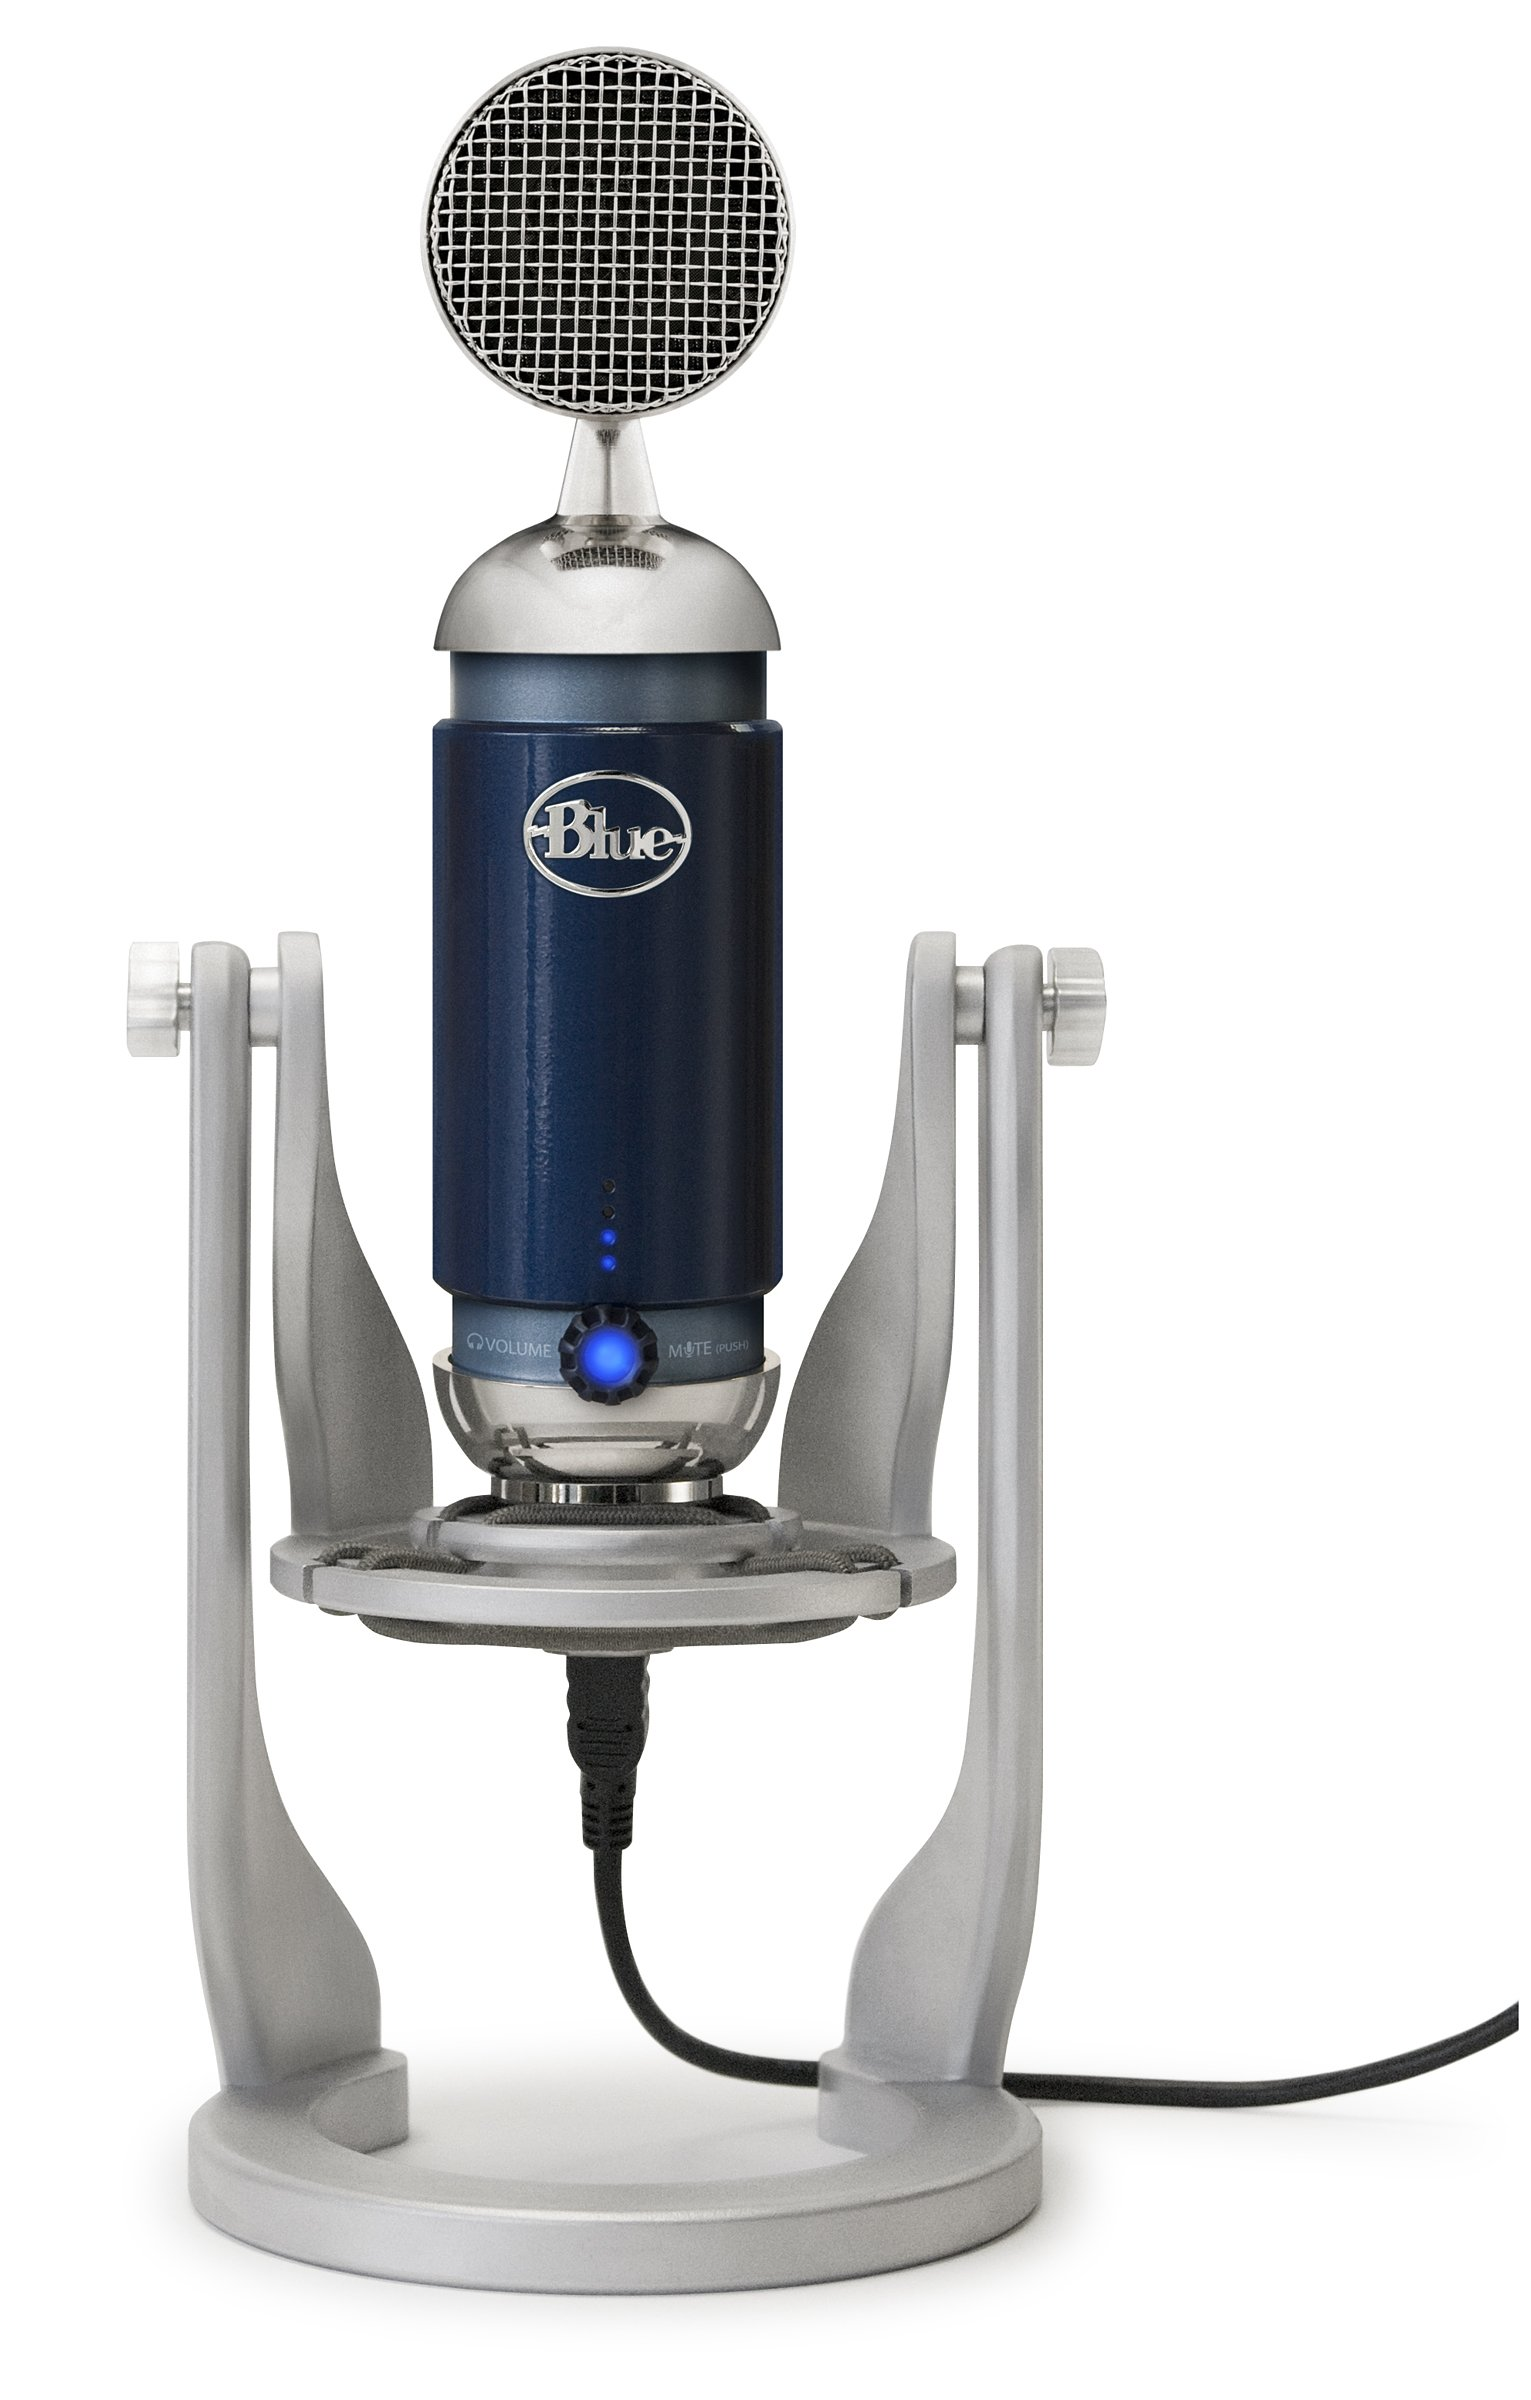 Blue SPARK DIGITAL LIGHTNING Condenser Microphone, Cardioid